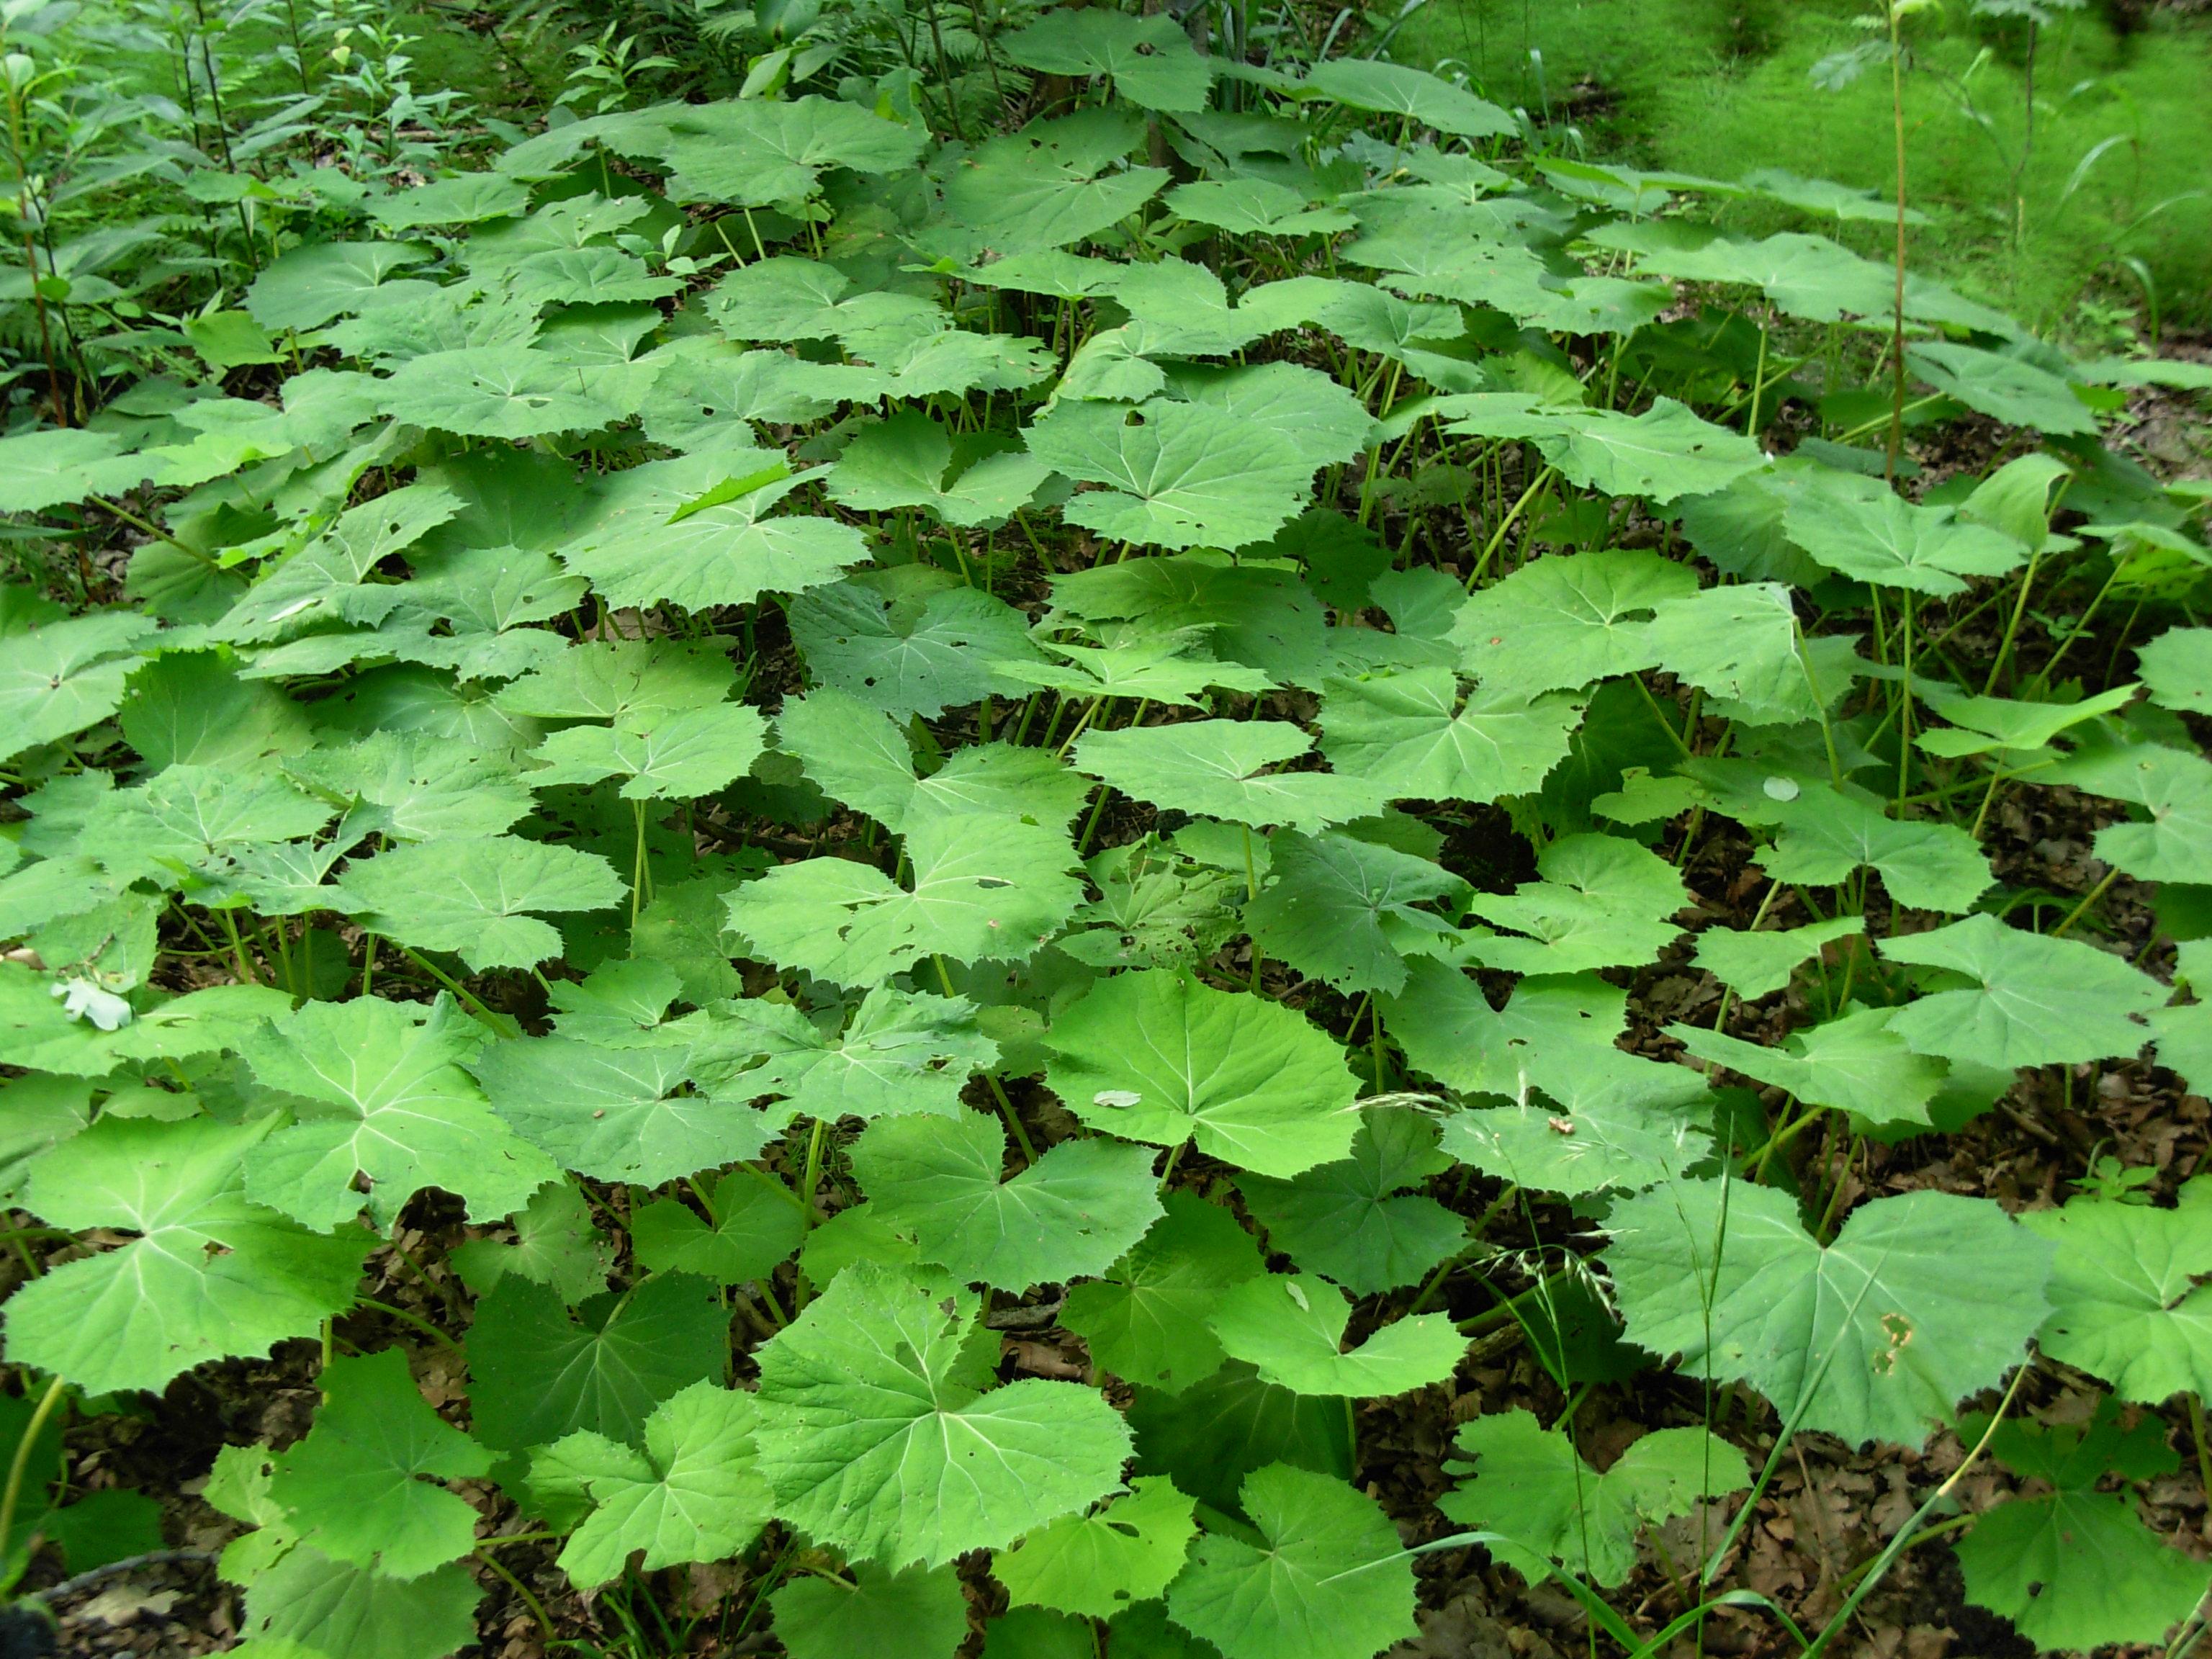 File:Green big leaves plants.JPG - Wikimedia Commons